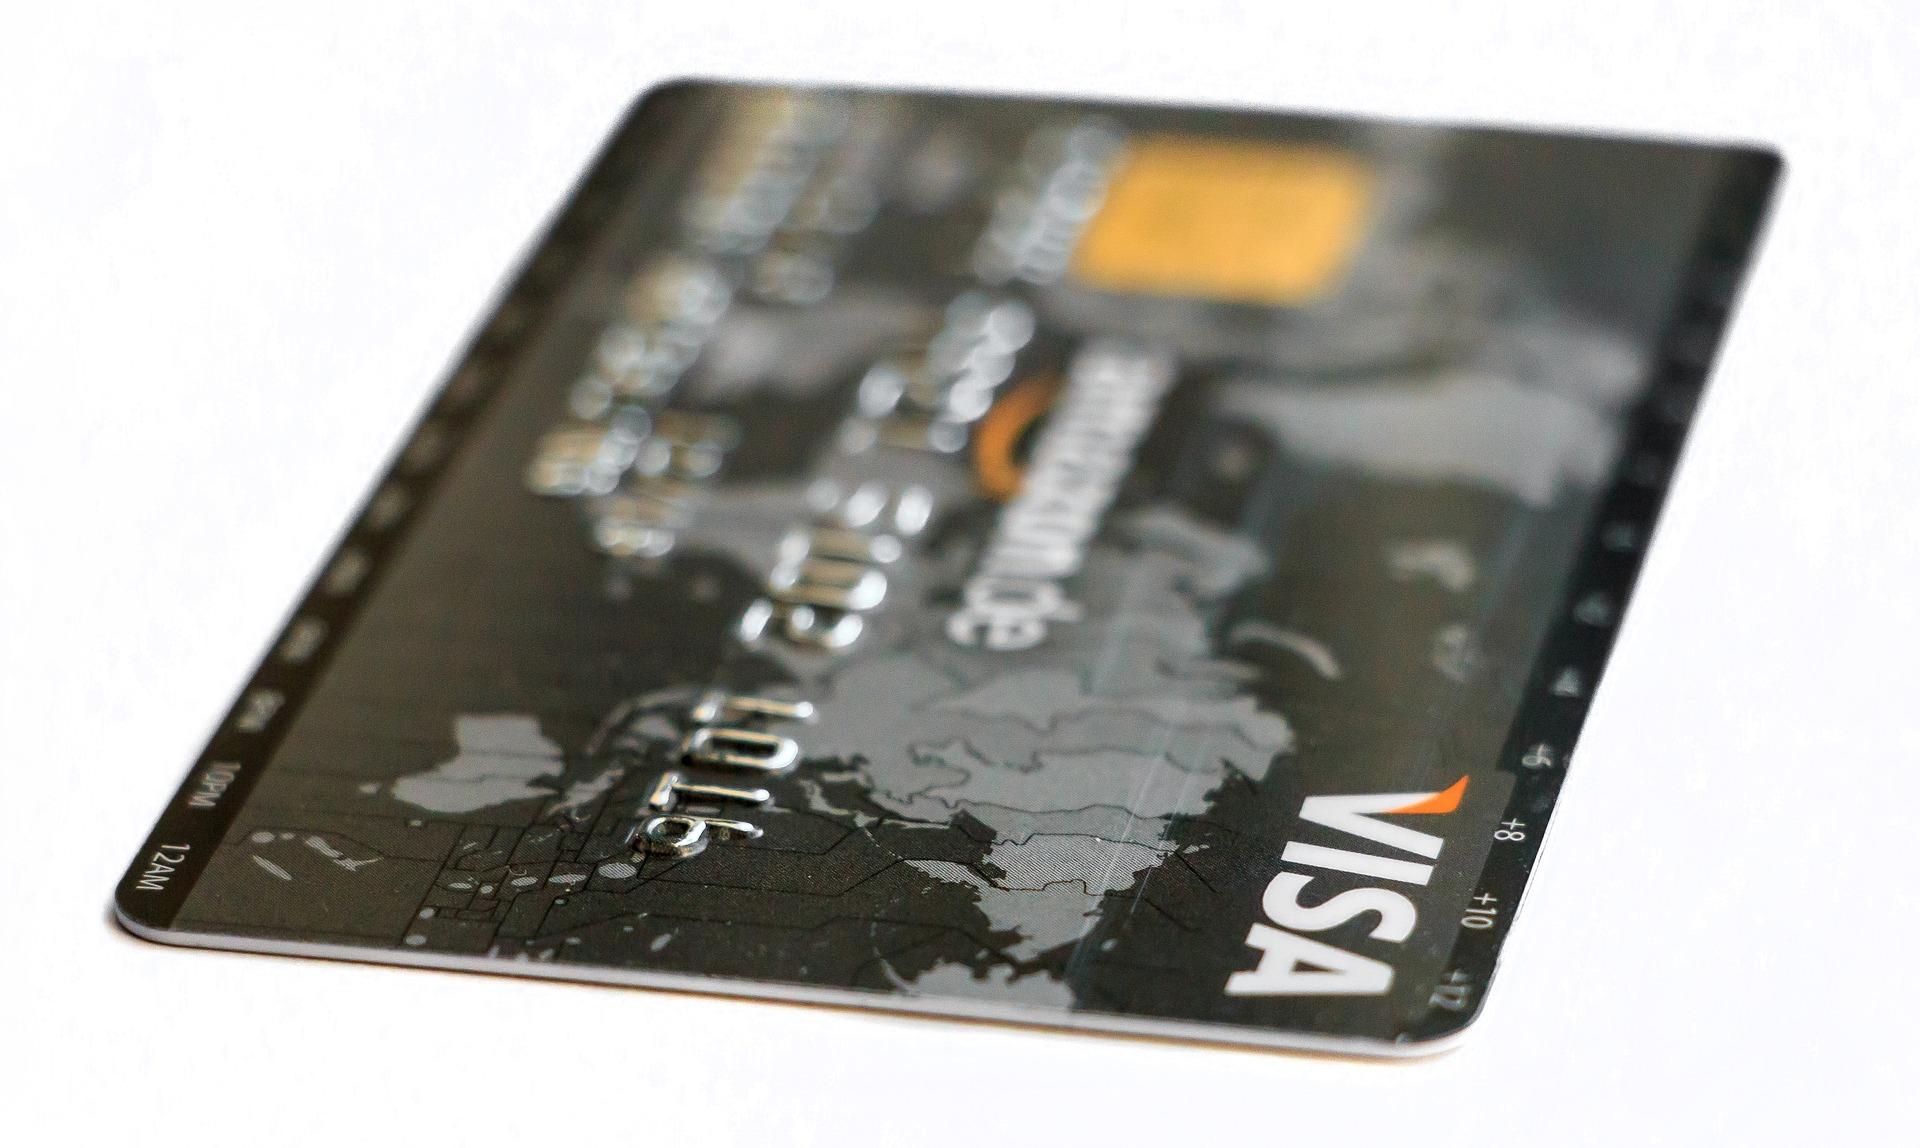 Visa security